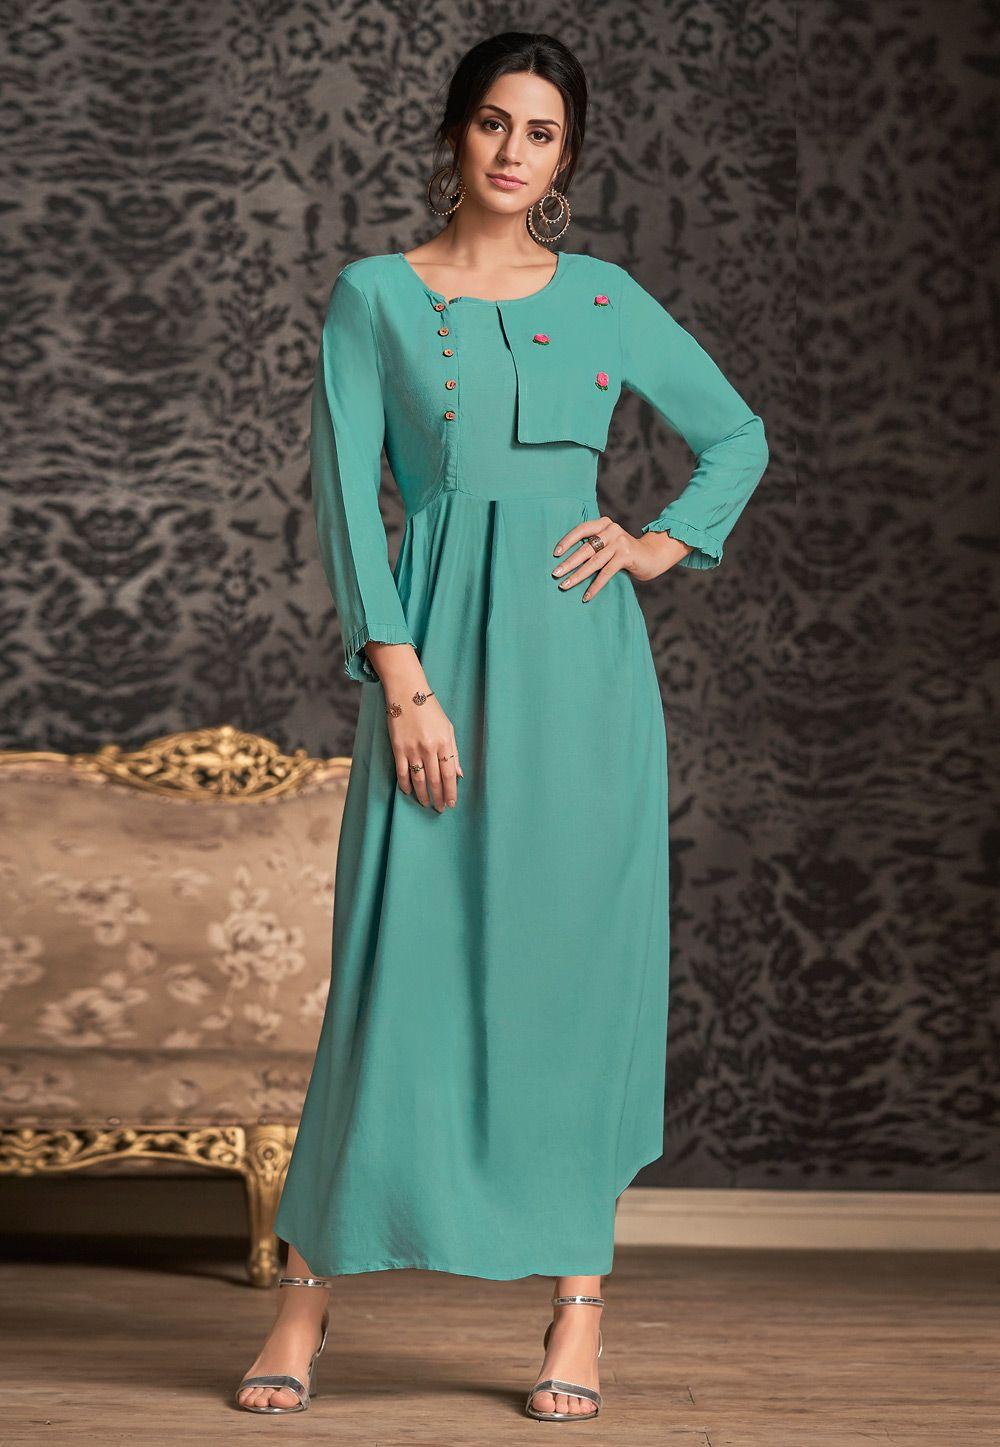 Sea Green Rayon Readymade Kurti 163400 | Fashion, Bollywood